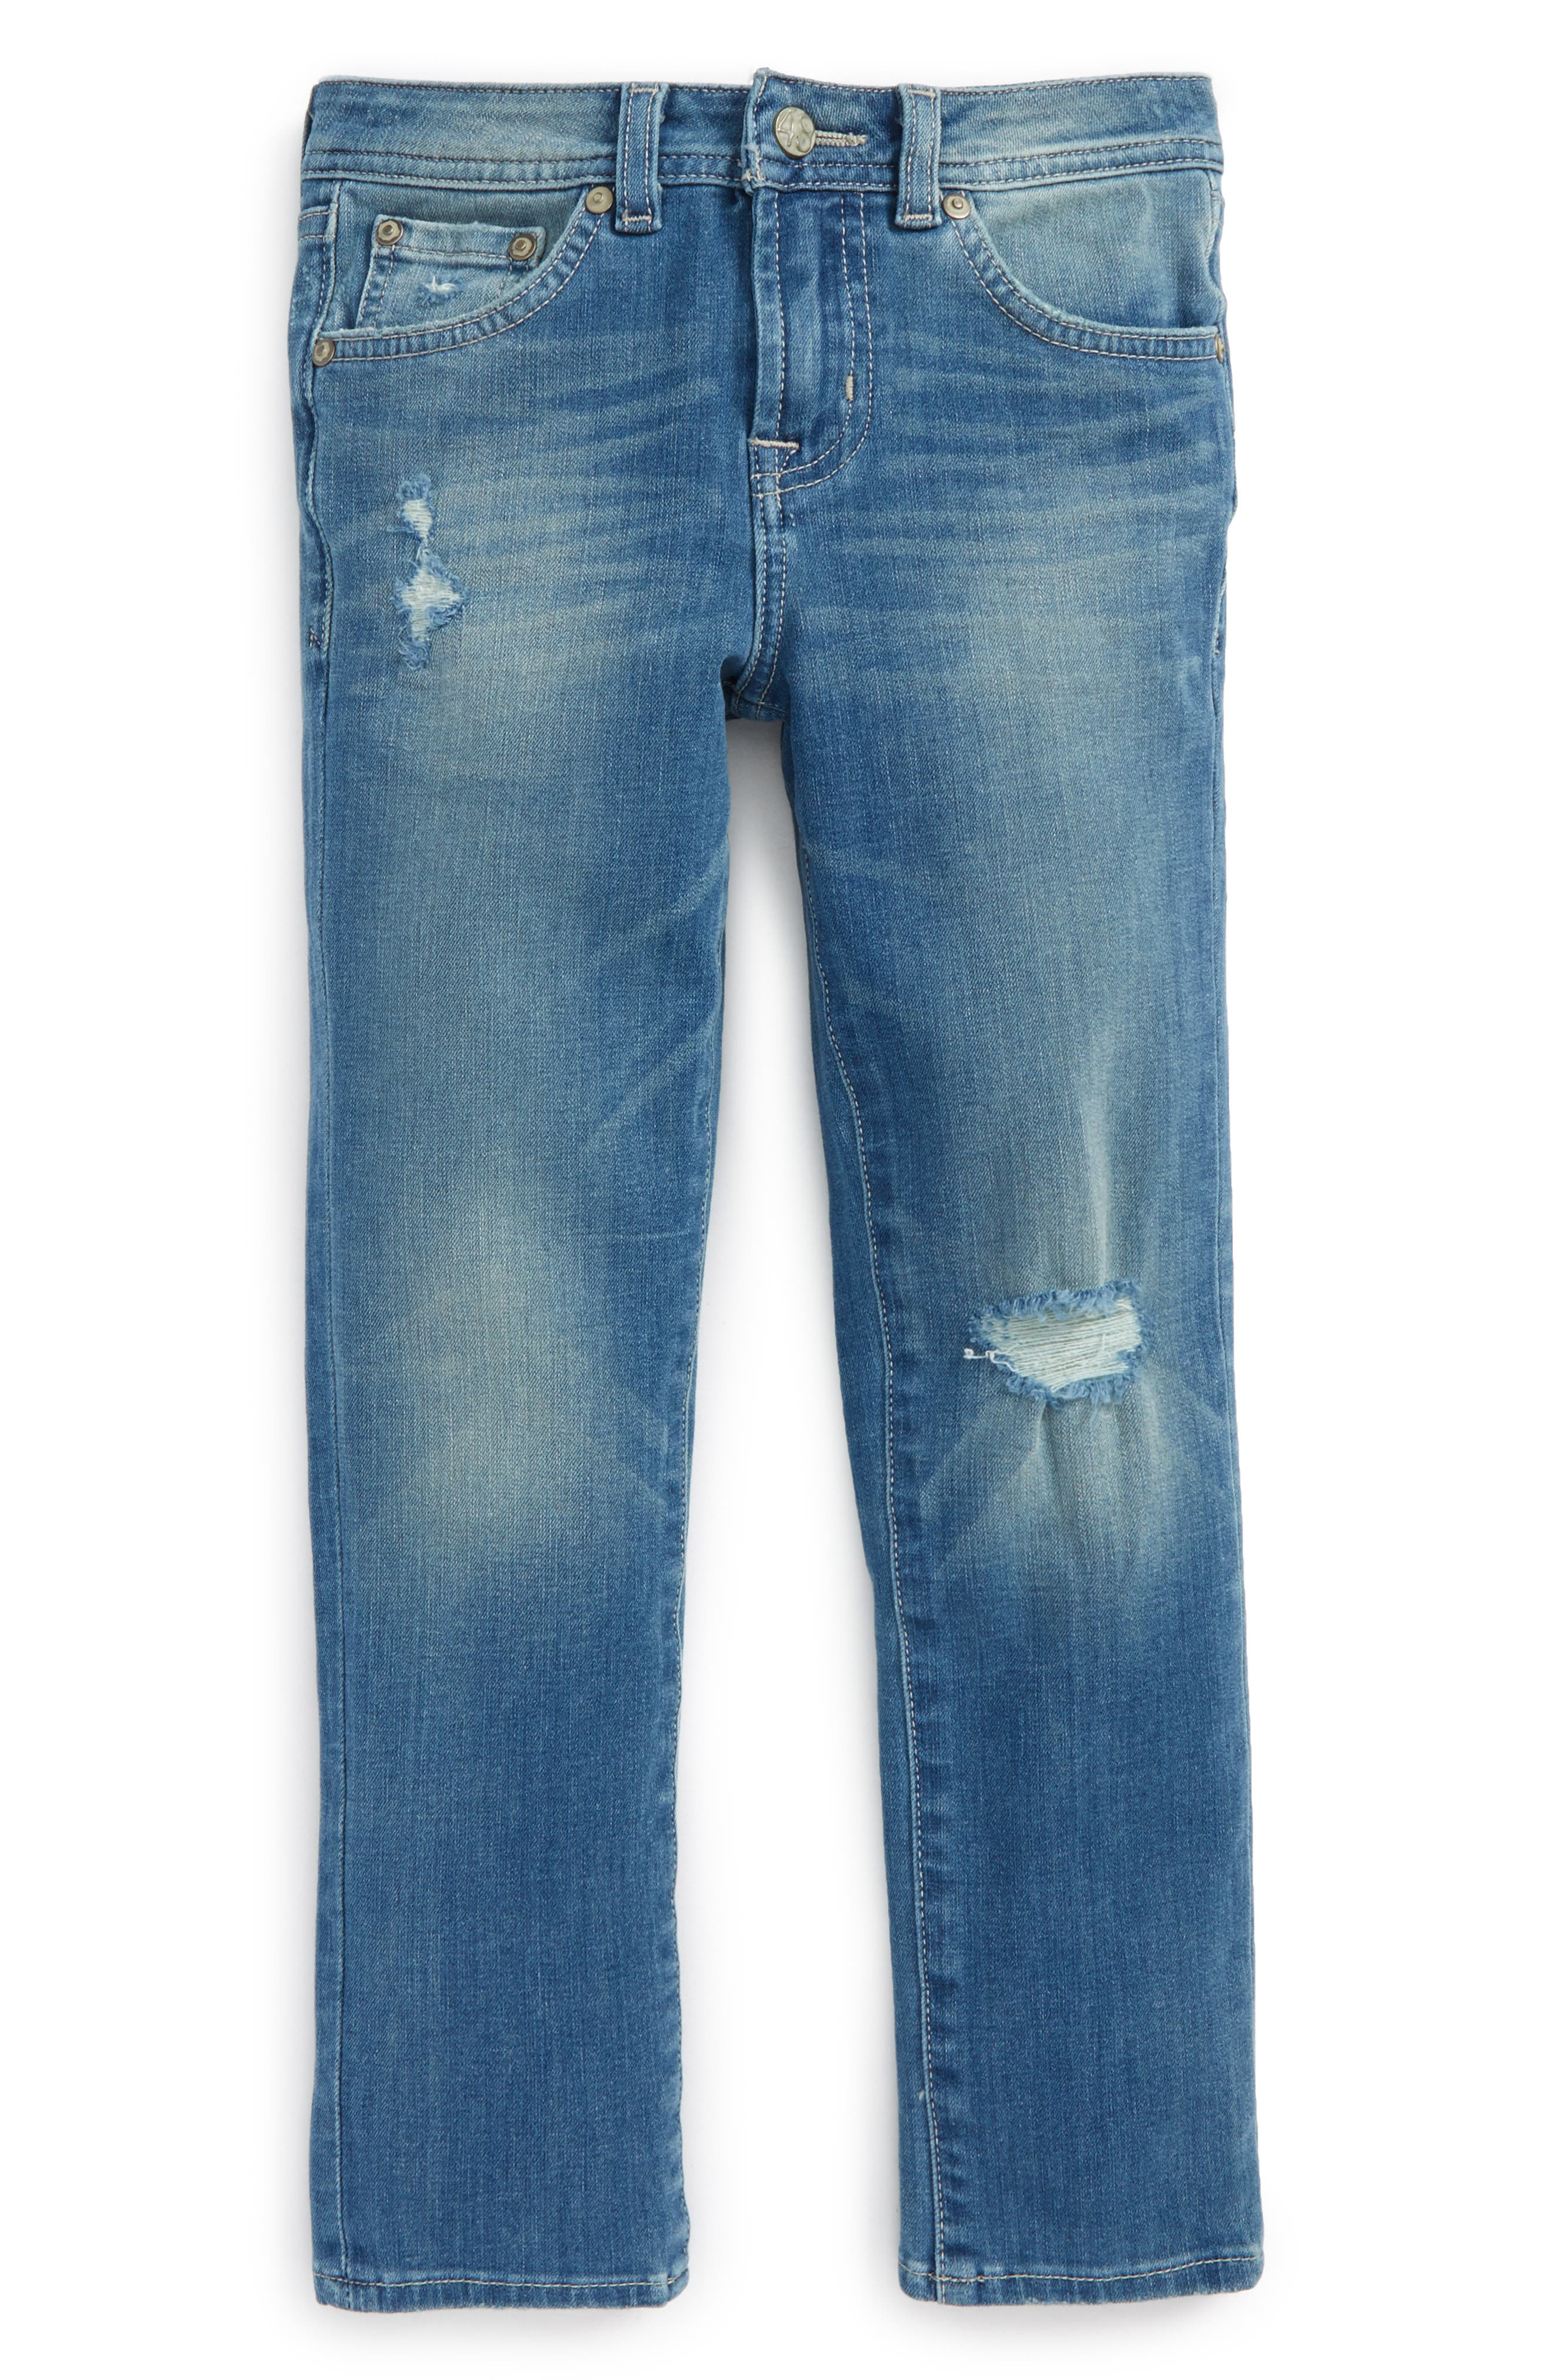 Main Image - ag adriano goldschmied kids The Noah Slim Straight Leg Jeans (Toddler Boys & Little Boys)